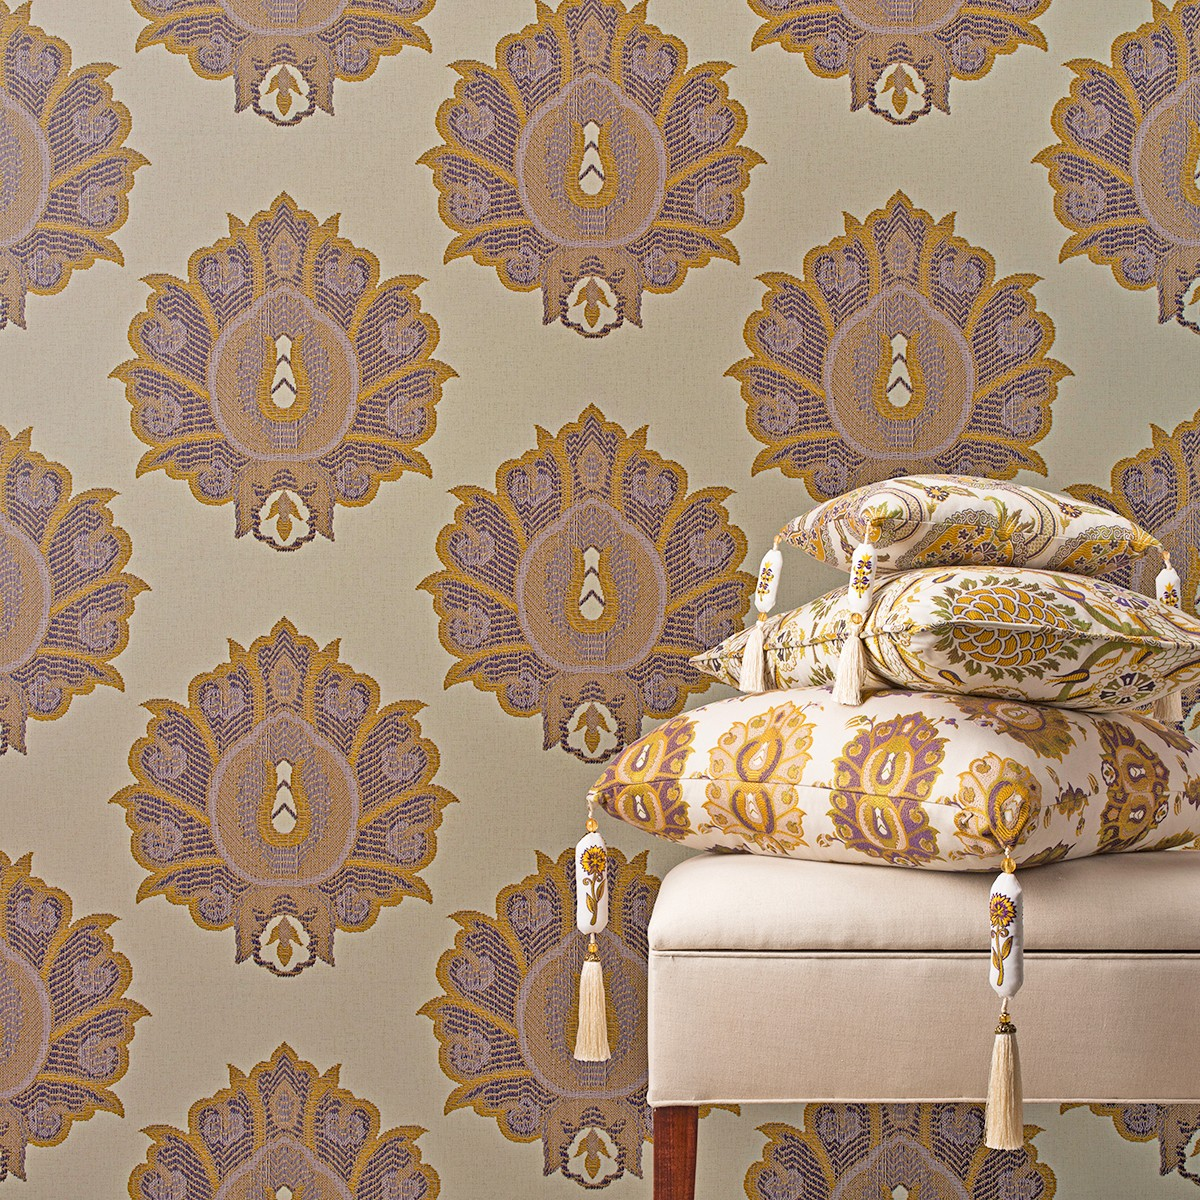 style3-hikmet-violet-luxury-ornate-wide-width-wallcovering-wallpaper